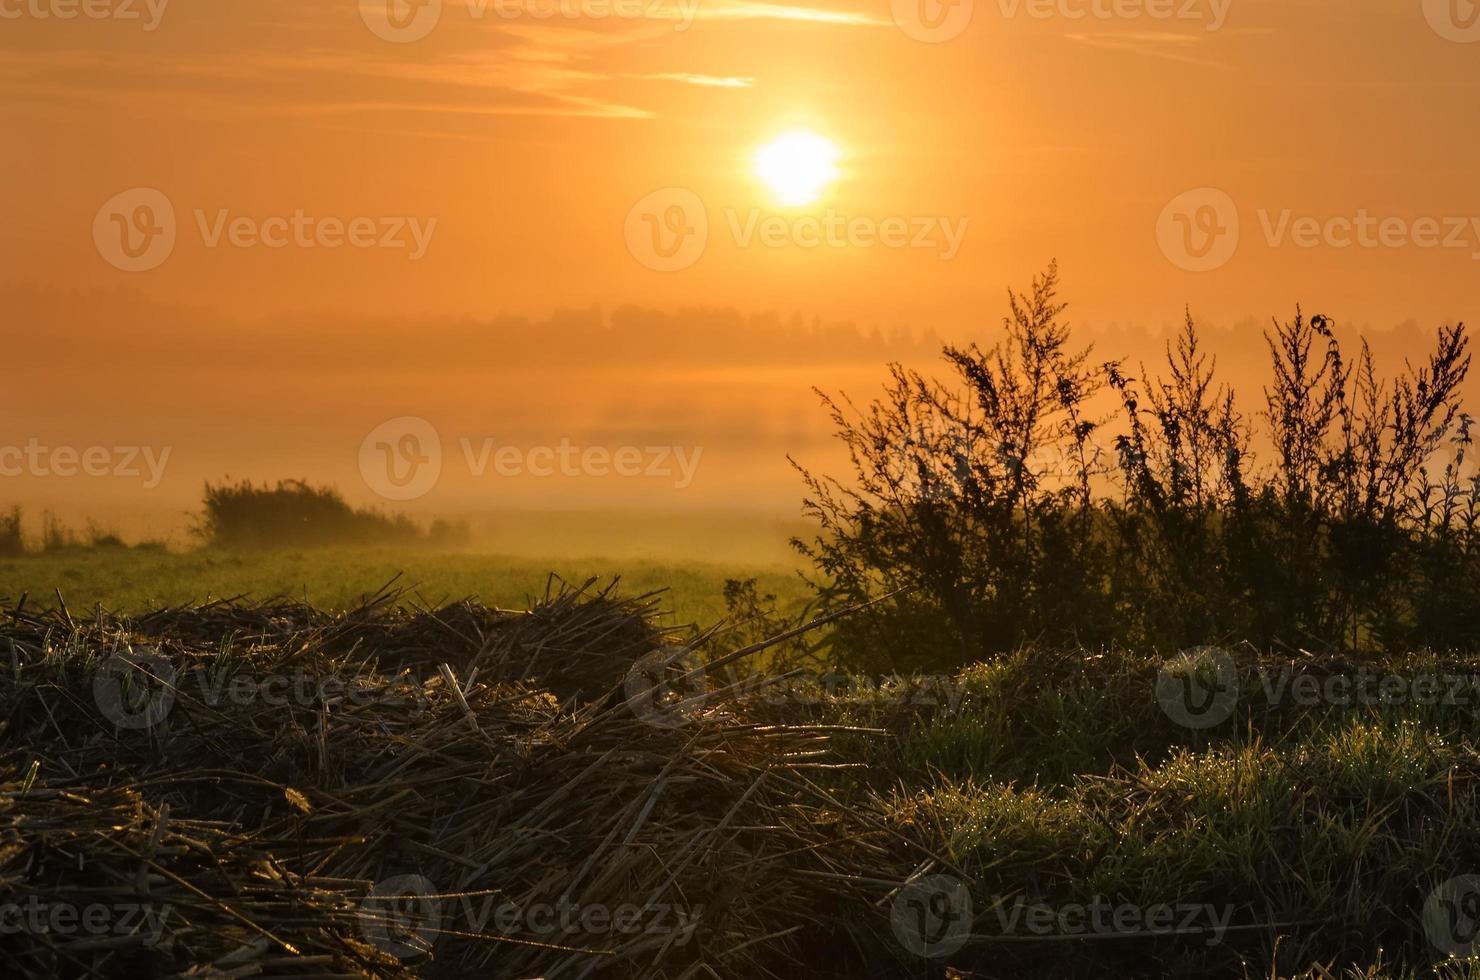 Landschaft am frühen Morgen. foto